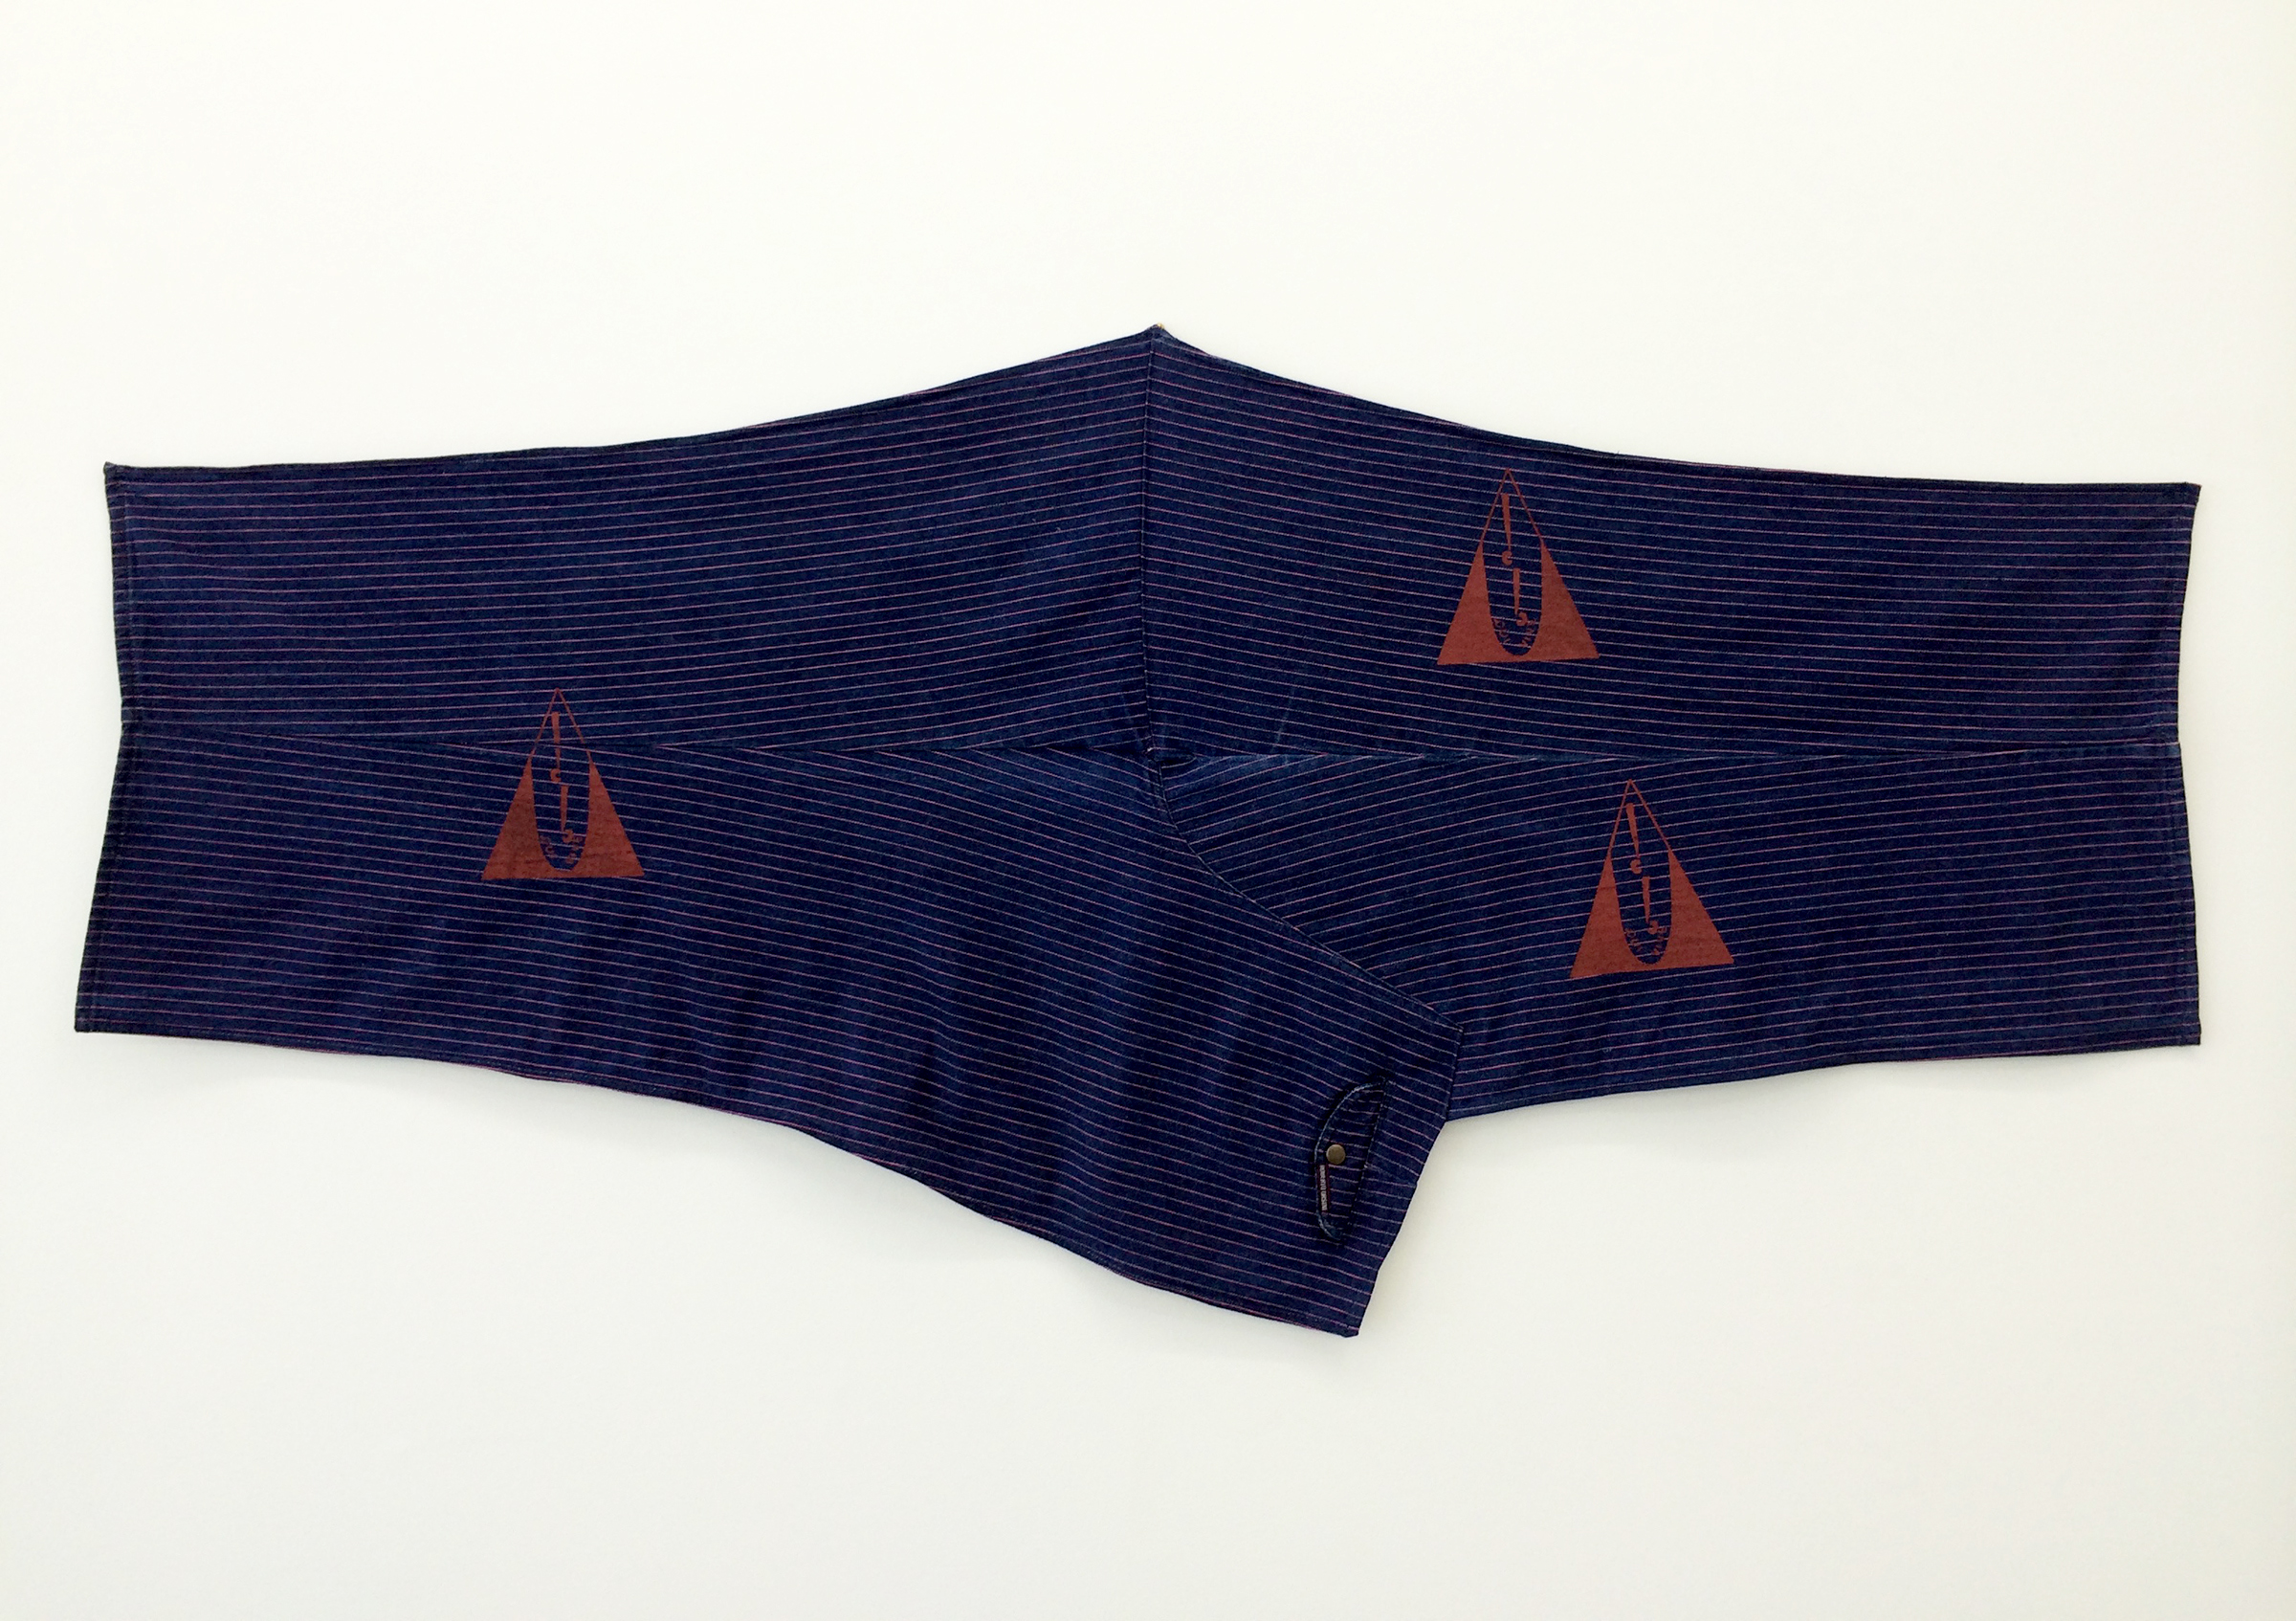 "AMANDA CURRERI  Qui Vive (Be Alert) , 2016, denim, vintage garment, acrylic, thread, 30"" x 60"""